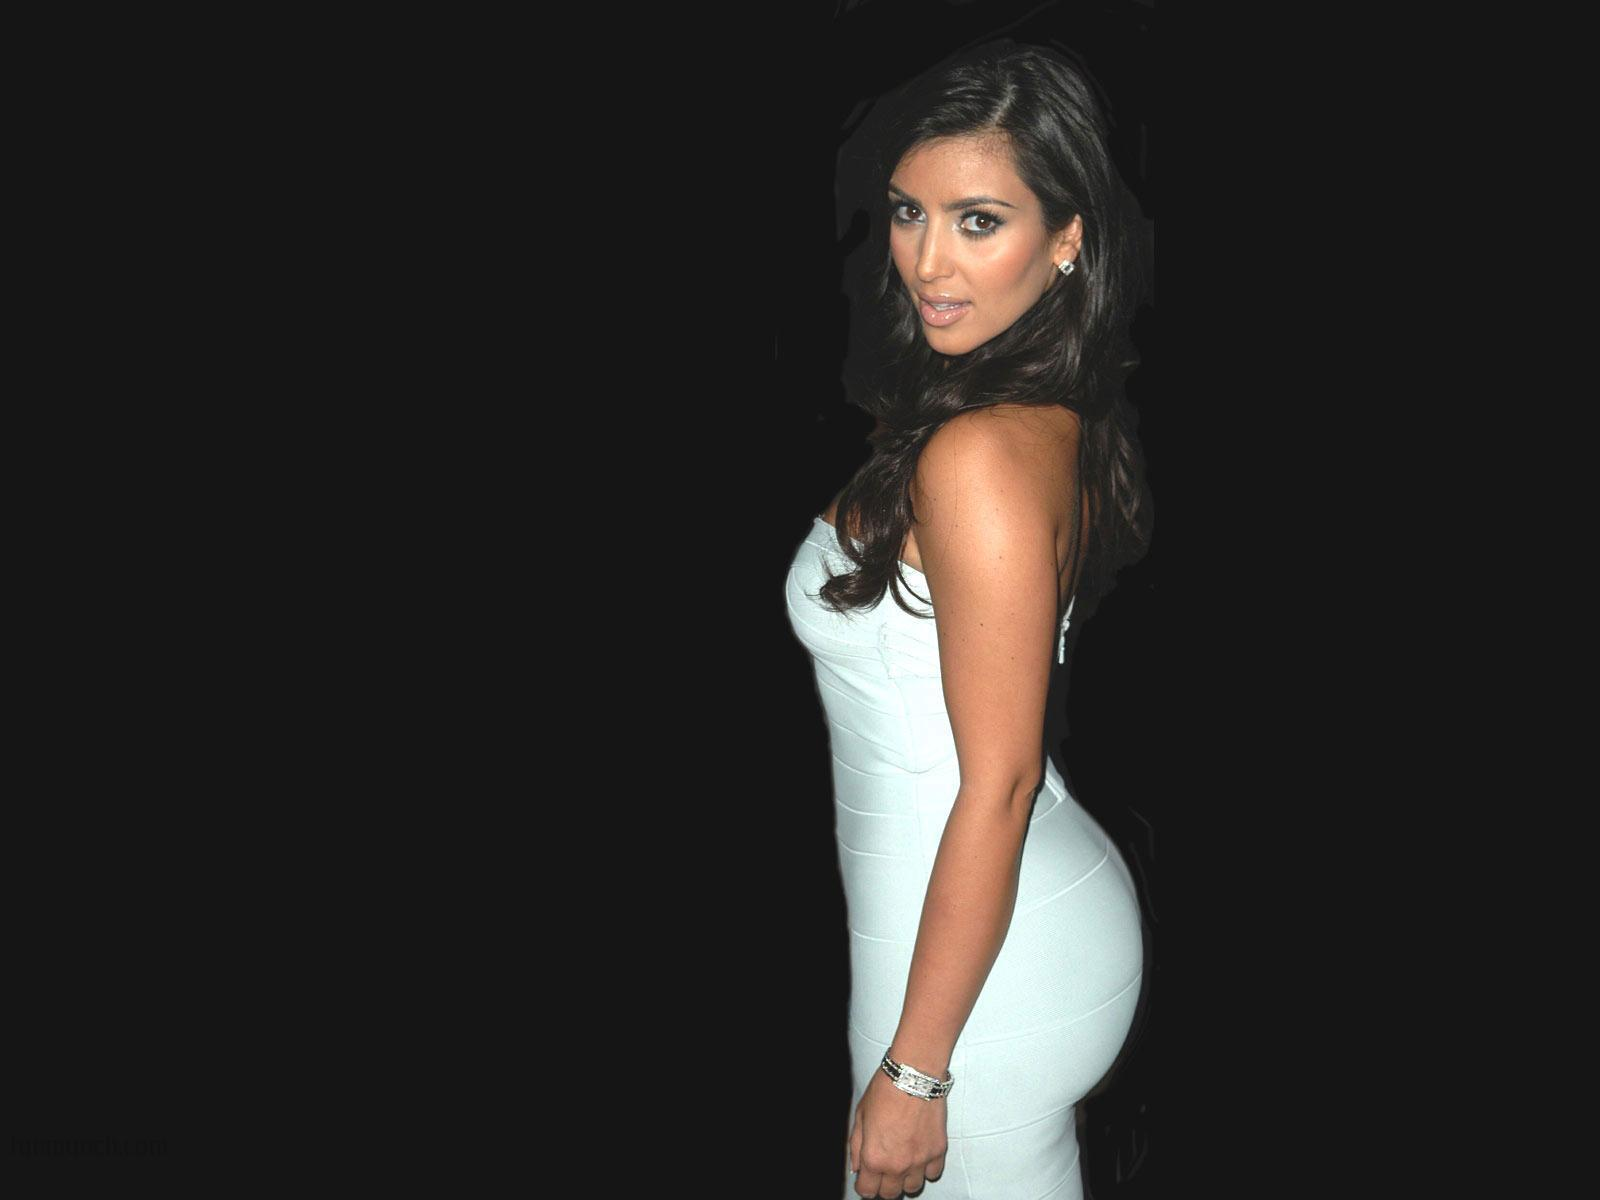 Kim-Kardashian-for-iPhone-%C3%97768-Kim-Kardashian-Picture-wallpaper-wp3407799